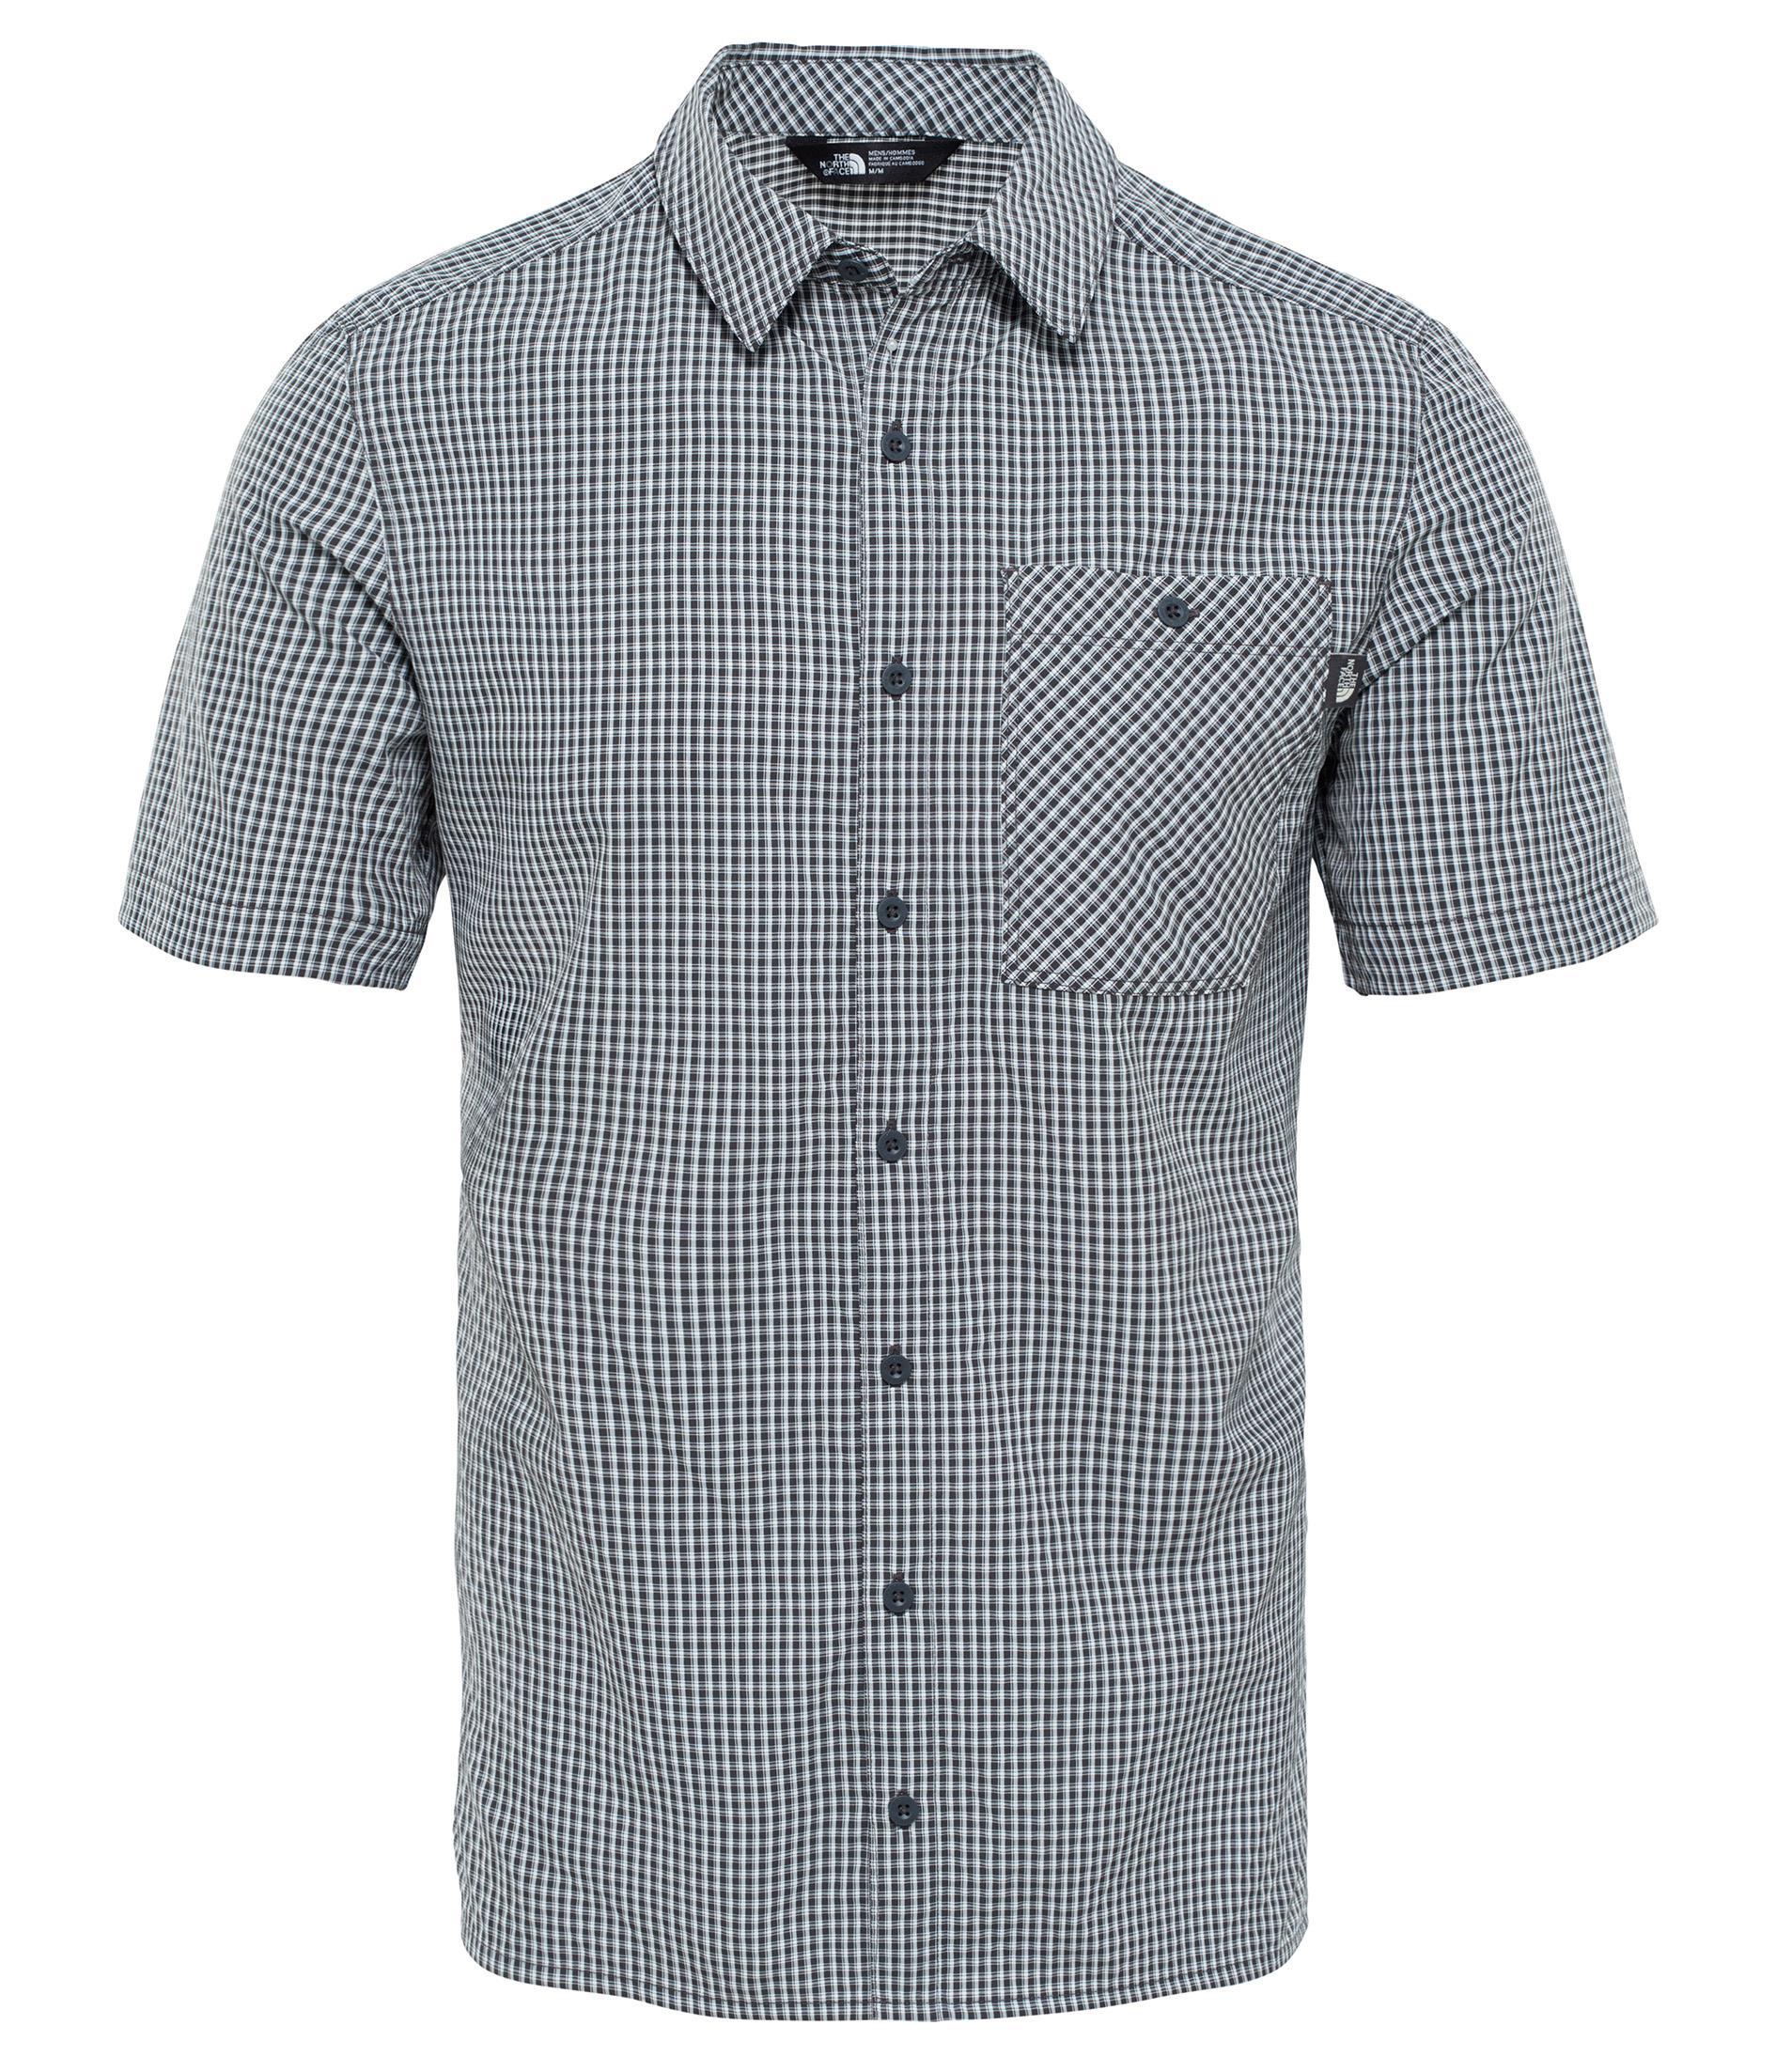 The Northface Erkek S/S Hypress Shirt T0Cd5Z0C5 Gömlek